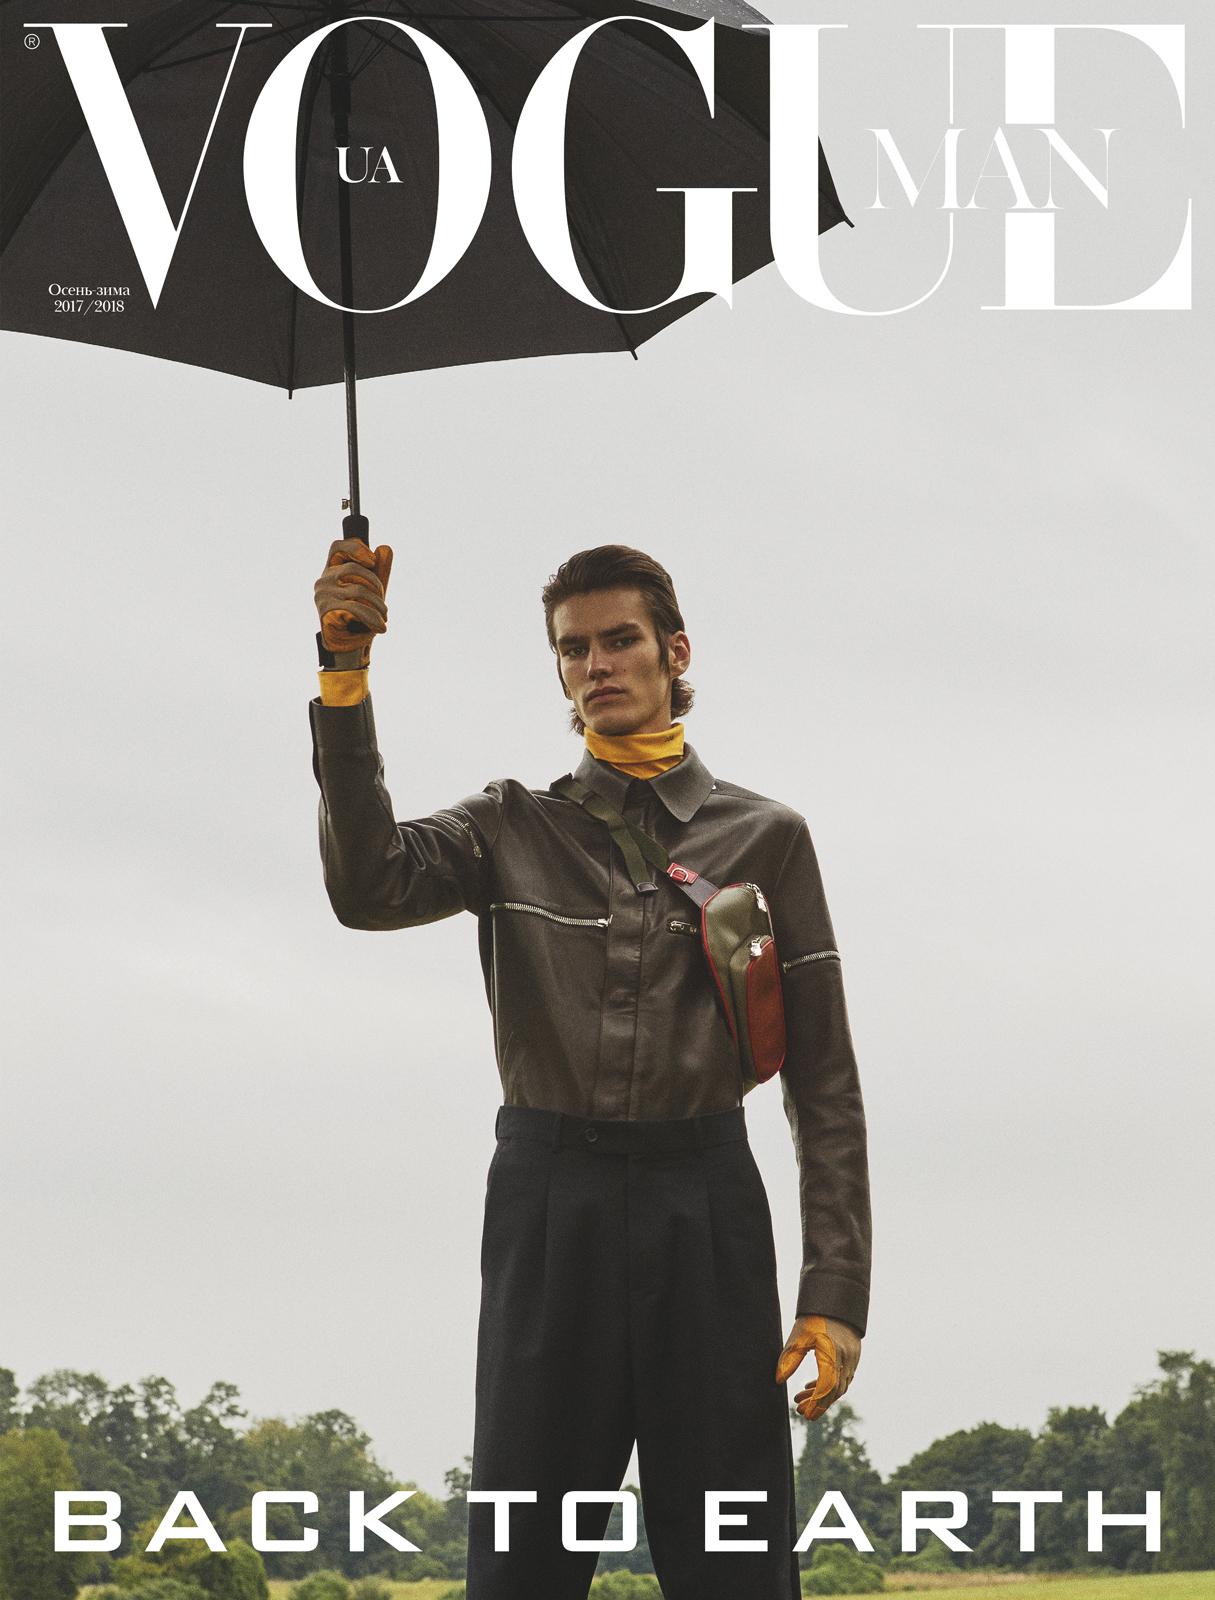 Vogue Man-EliasdePOOT-Cover.jpg